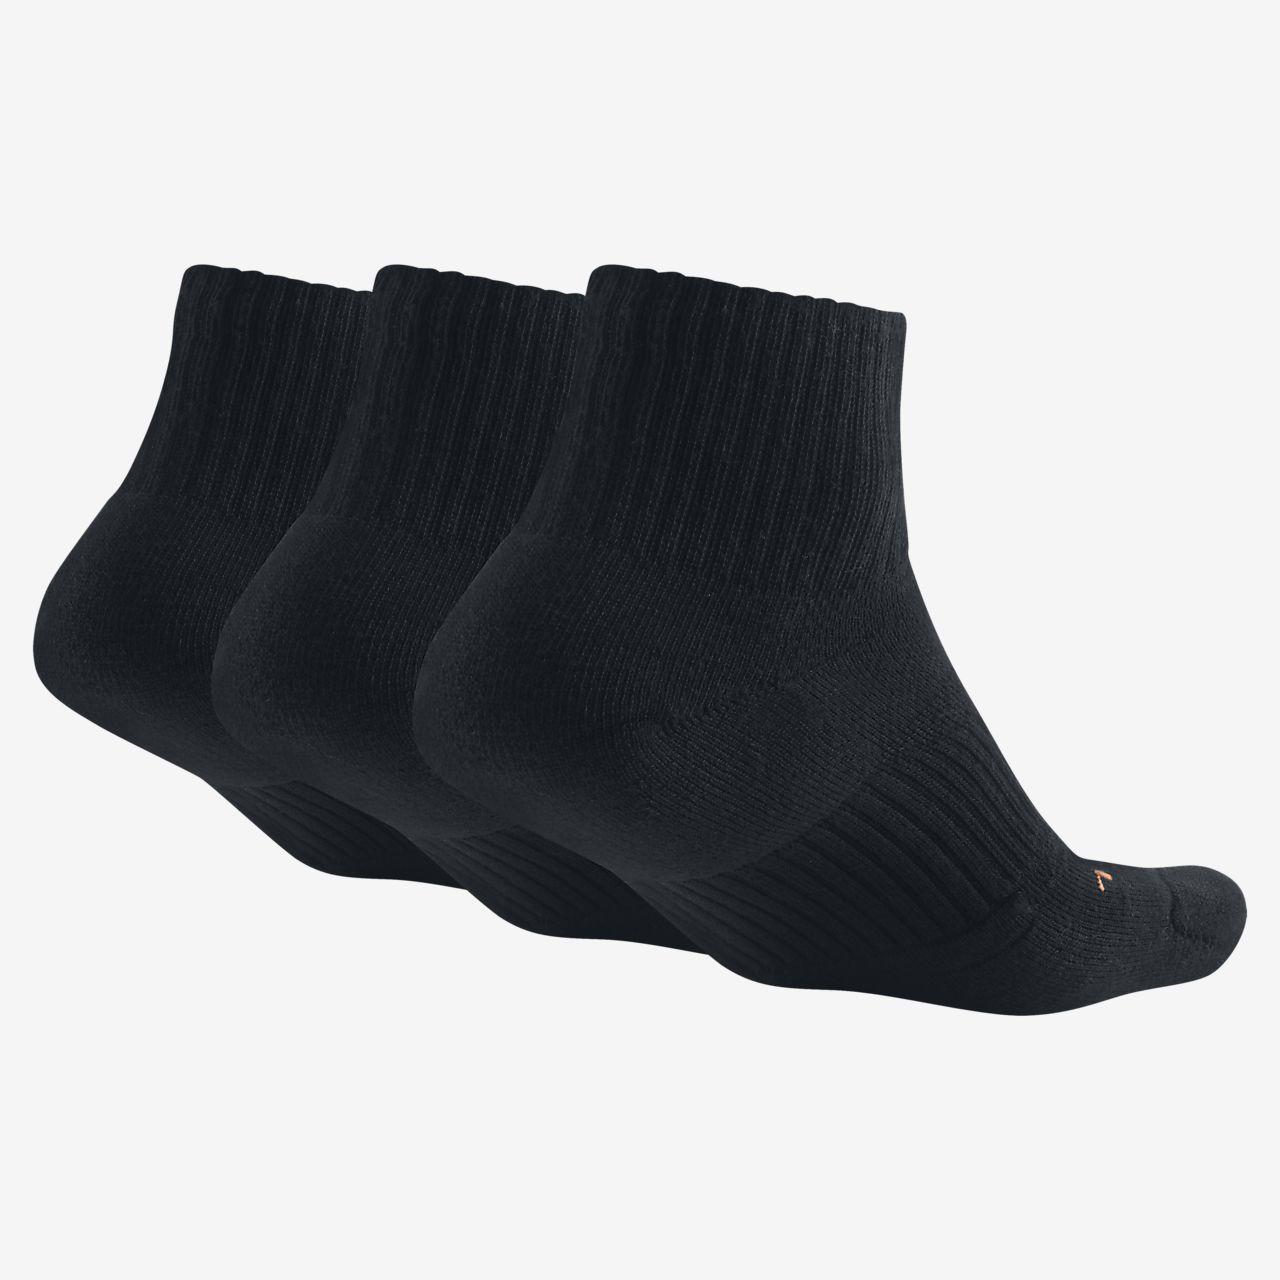 nike dri fit half cushion quarter 3 pair training socks. Black Bedroom Furniture Sets. Home Design Ideas